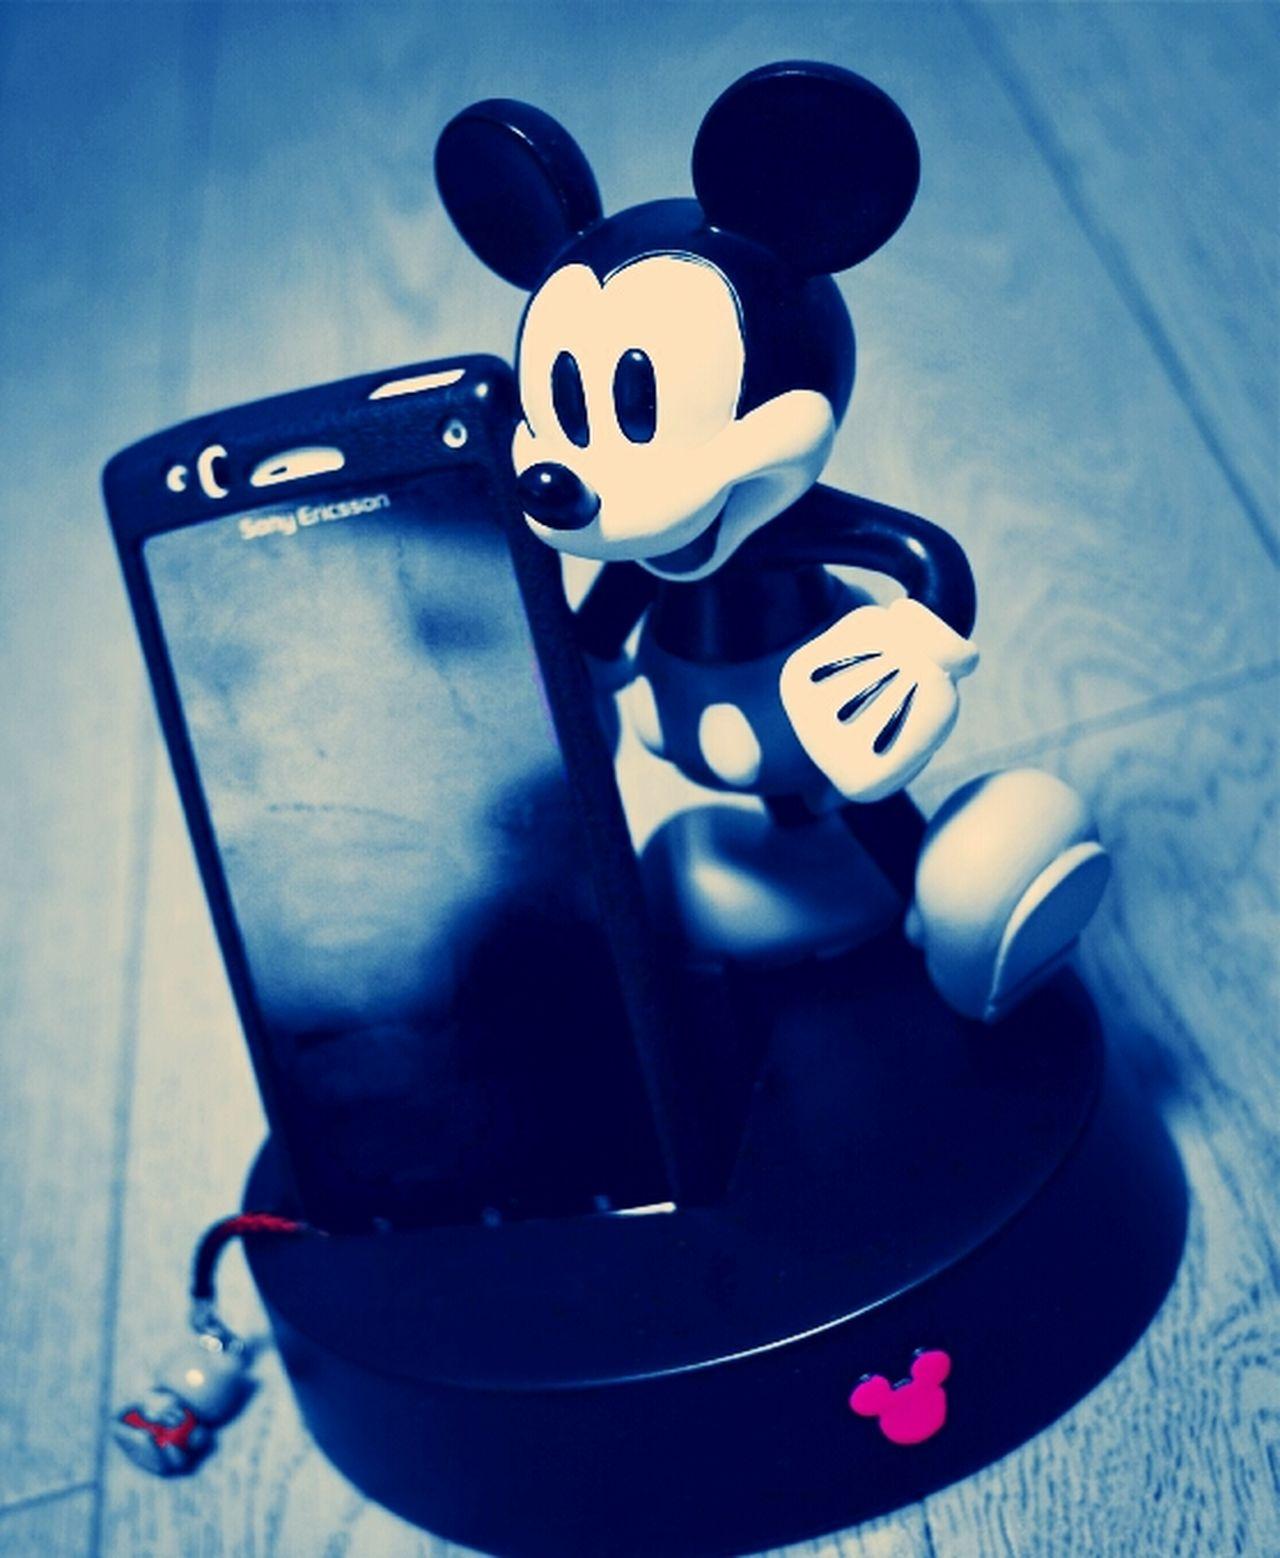 Disney Mickey Mouse Takumar 28mm F3.5